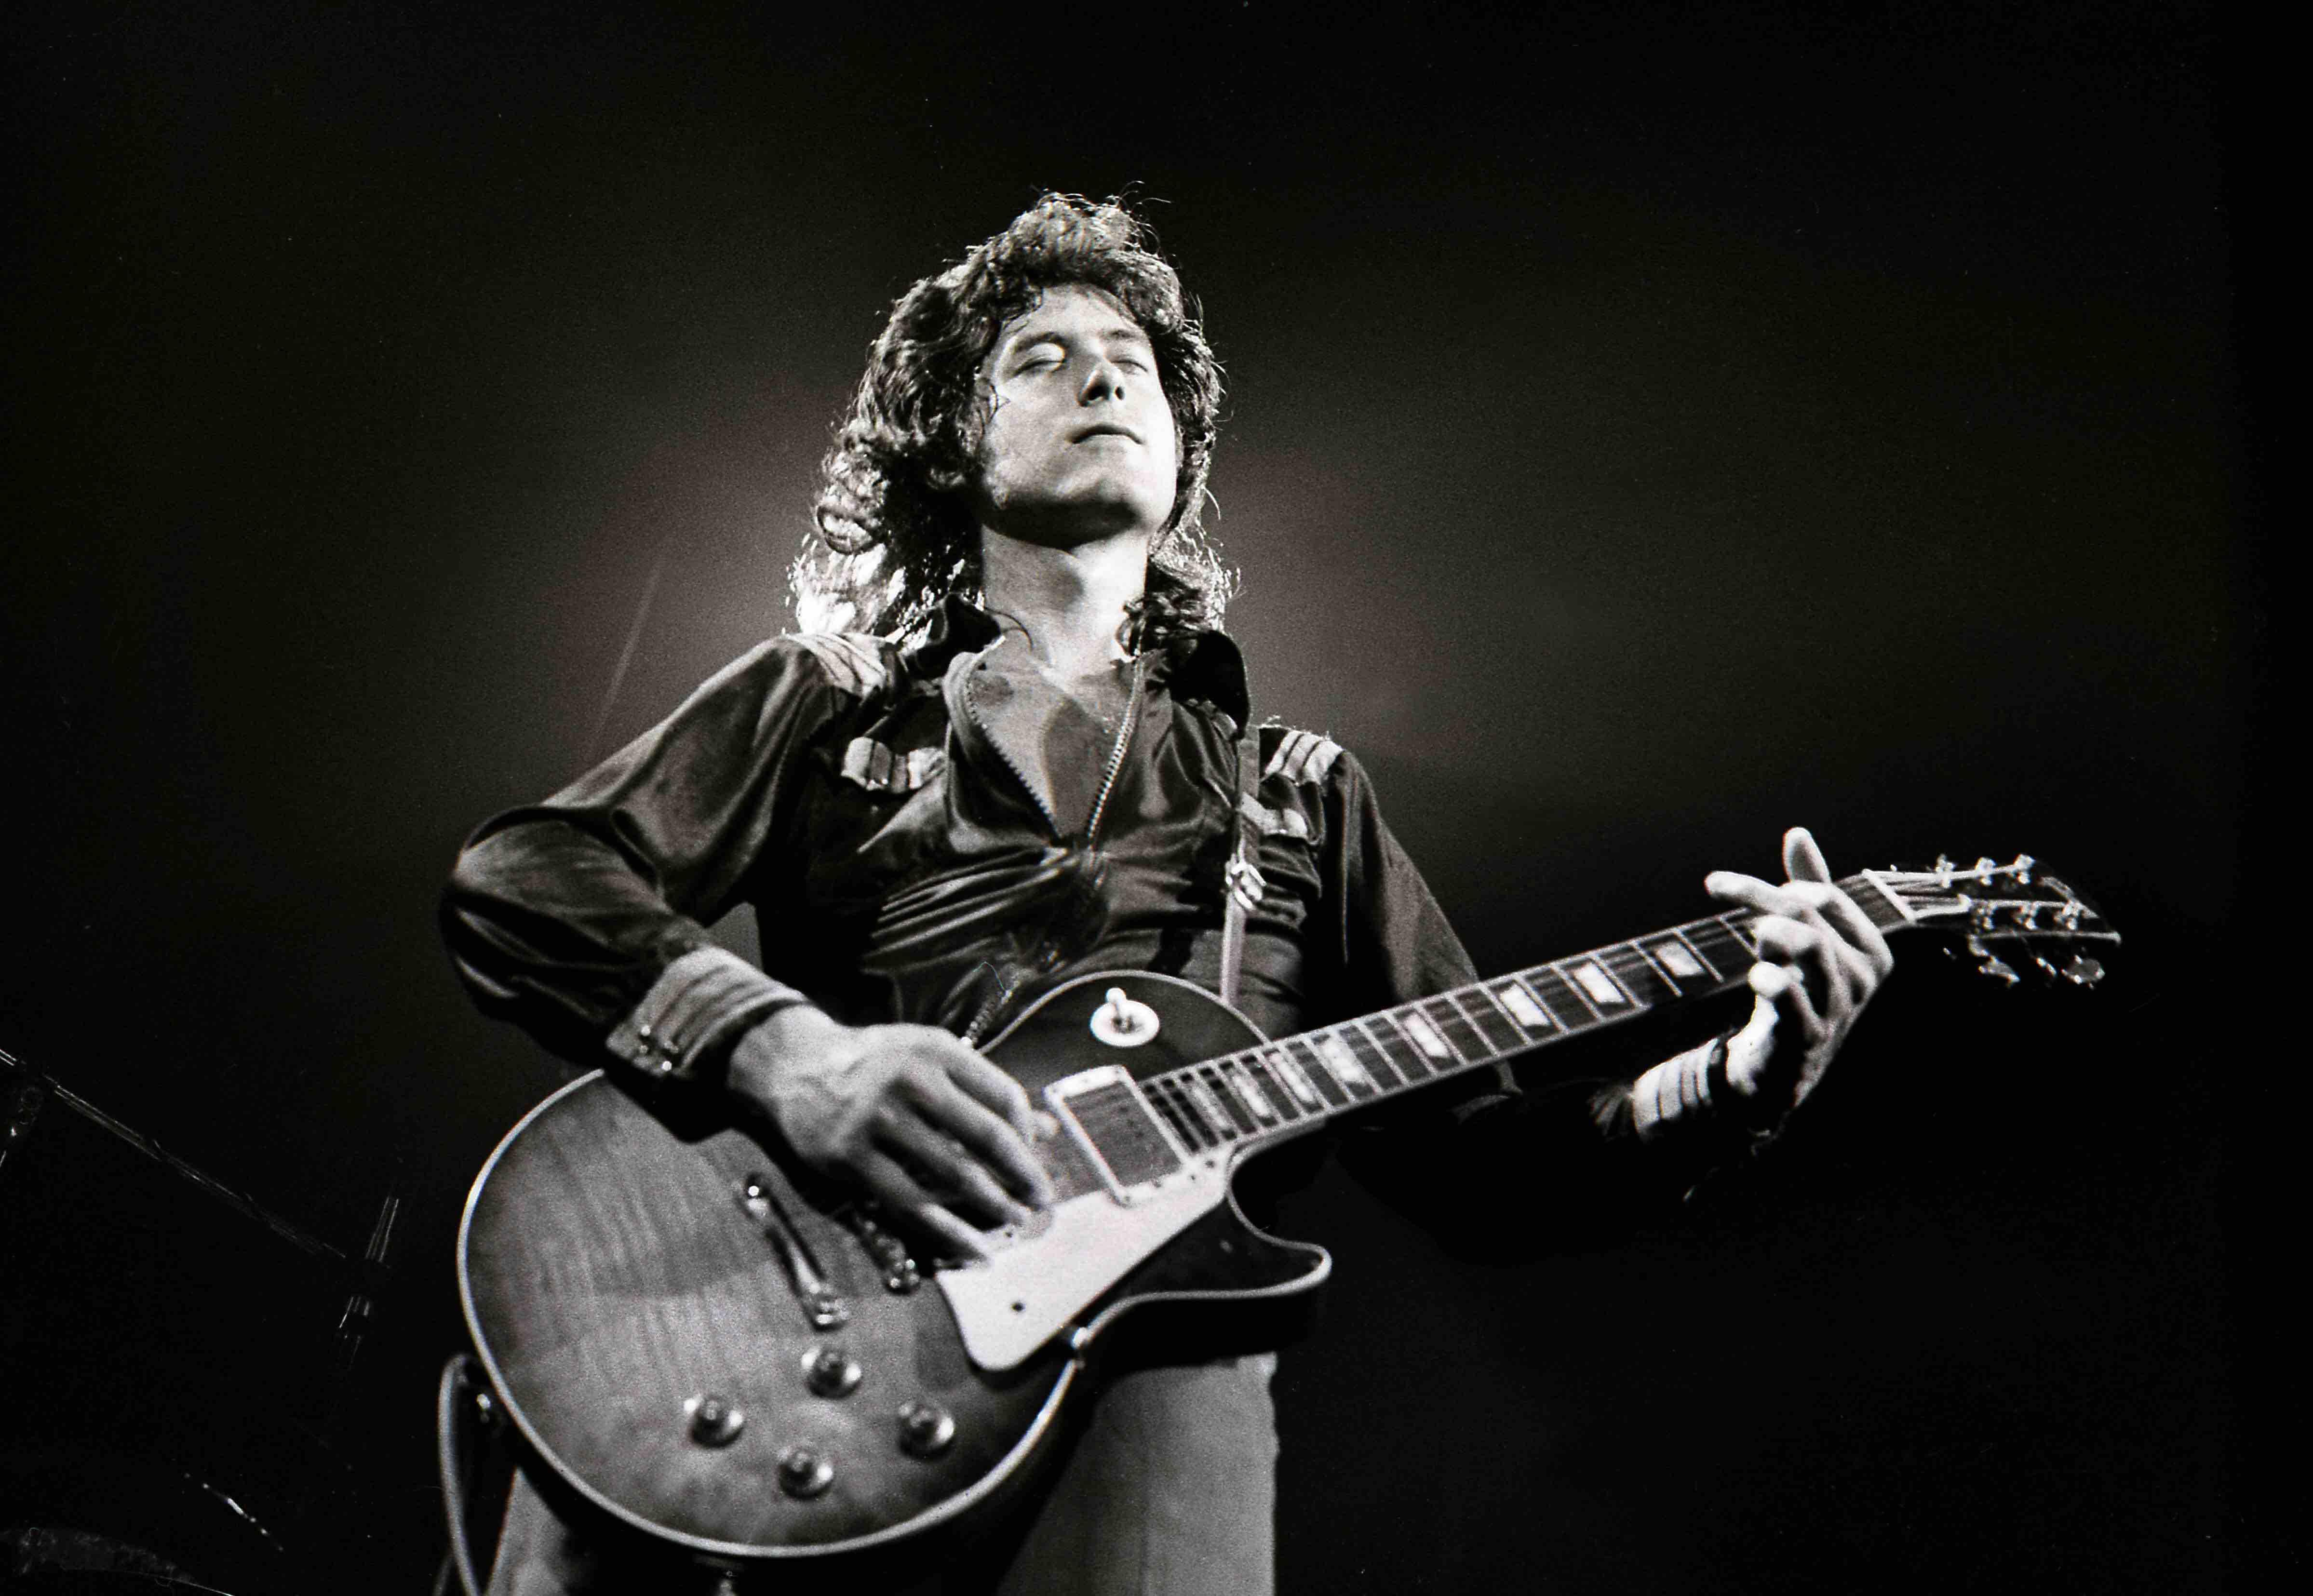 Jimmy Page Led Zeppelin 001 Framed Canvas Print